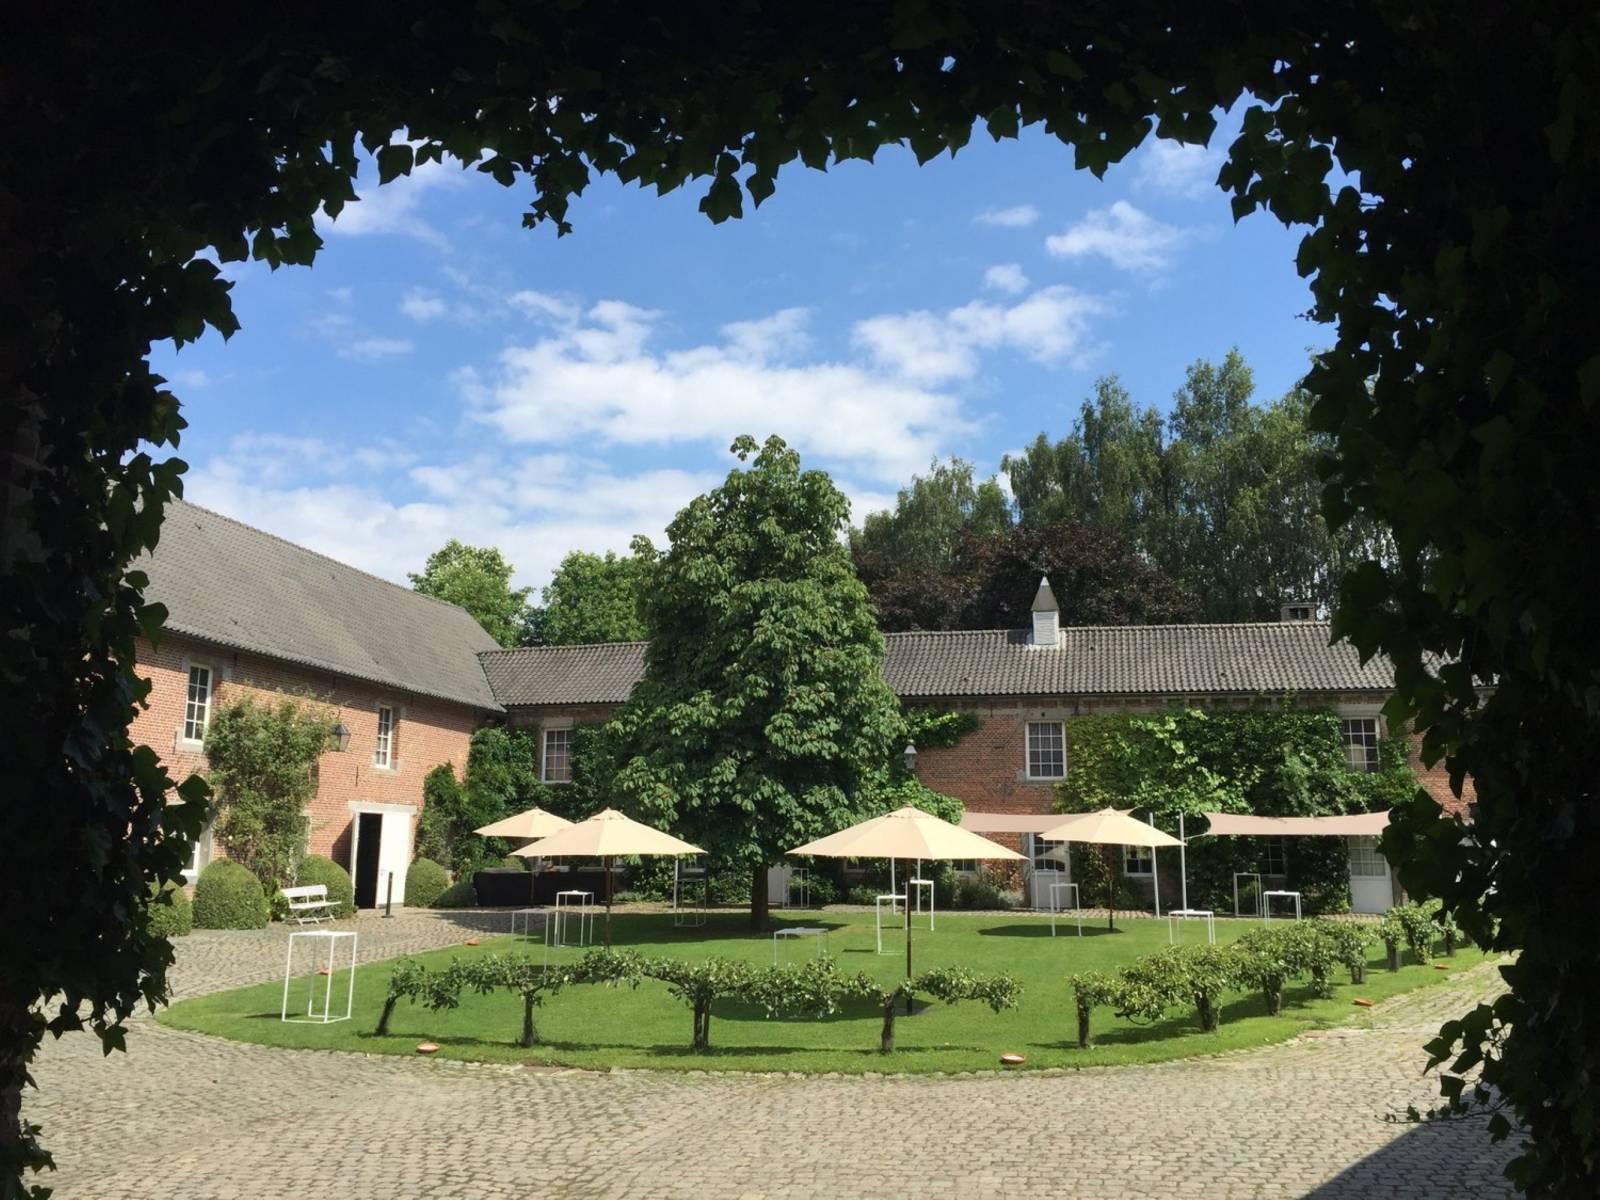 La ferme de Balingue House of Weddings feestzaal salle de fete lieu exceptionnel huwelijk mariage trouwen trouwzaal Brusse (24)